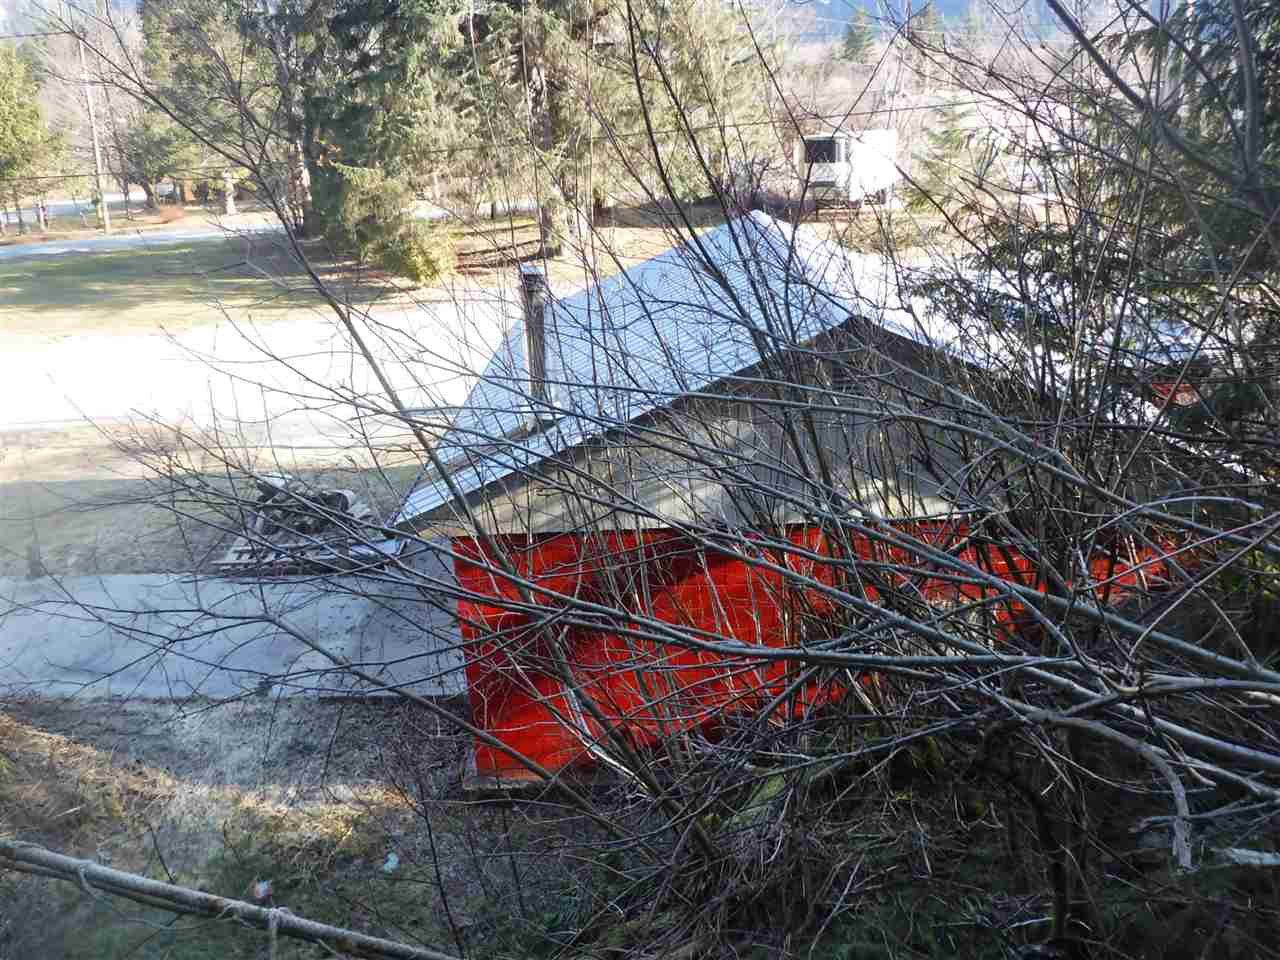 Photo 4: Photos: 267 MACKENZIE 20 Highway in Bella Coola: Bella Coola/Hagensborg House for sale (Williams Lake (Zone 27))  : MLS®# R2431951